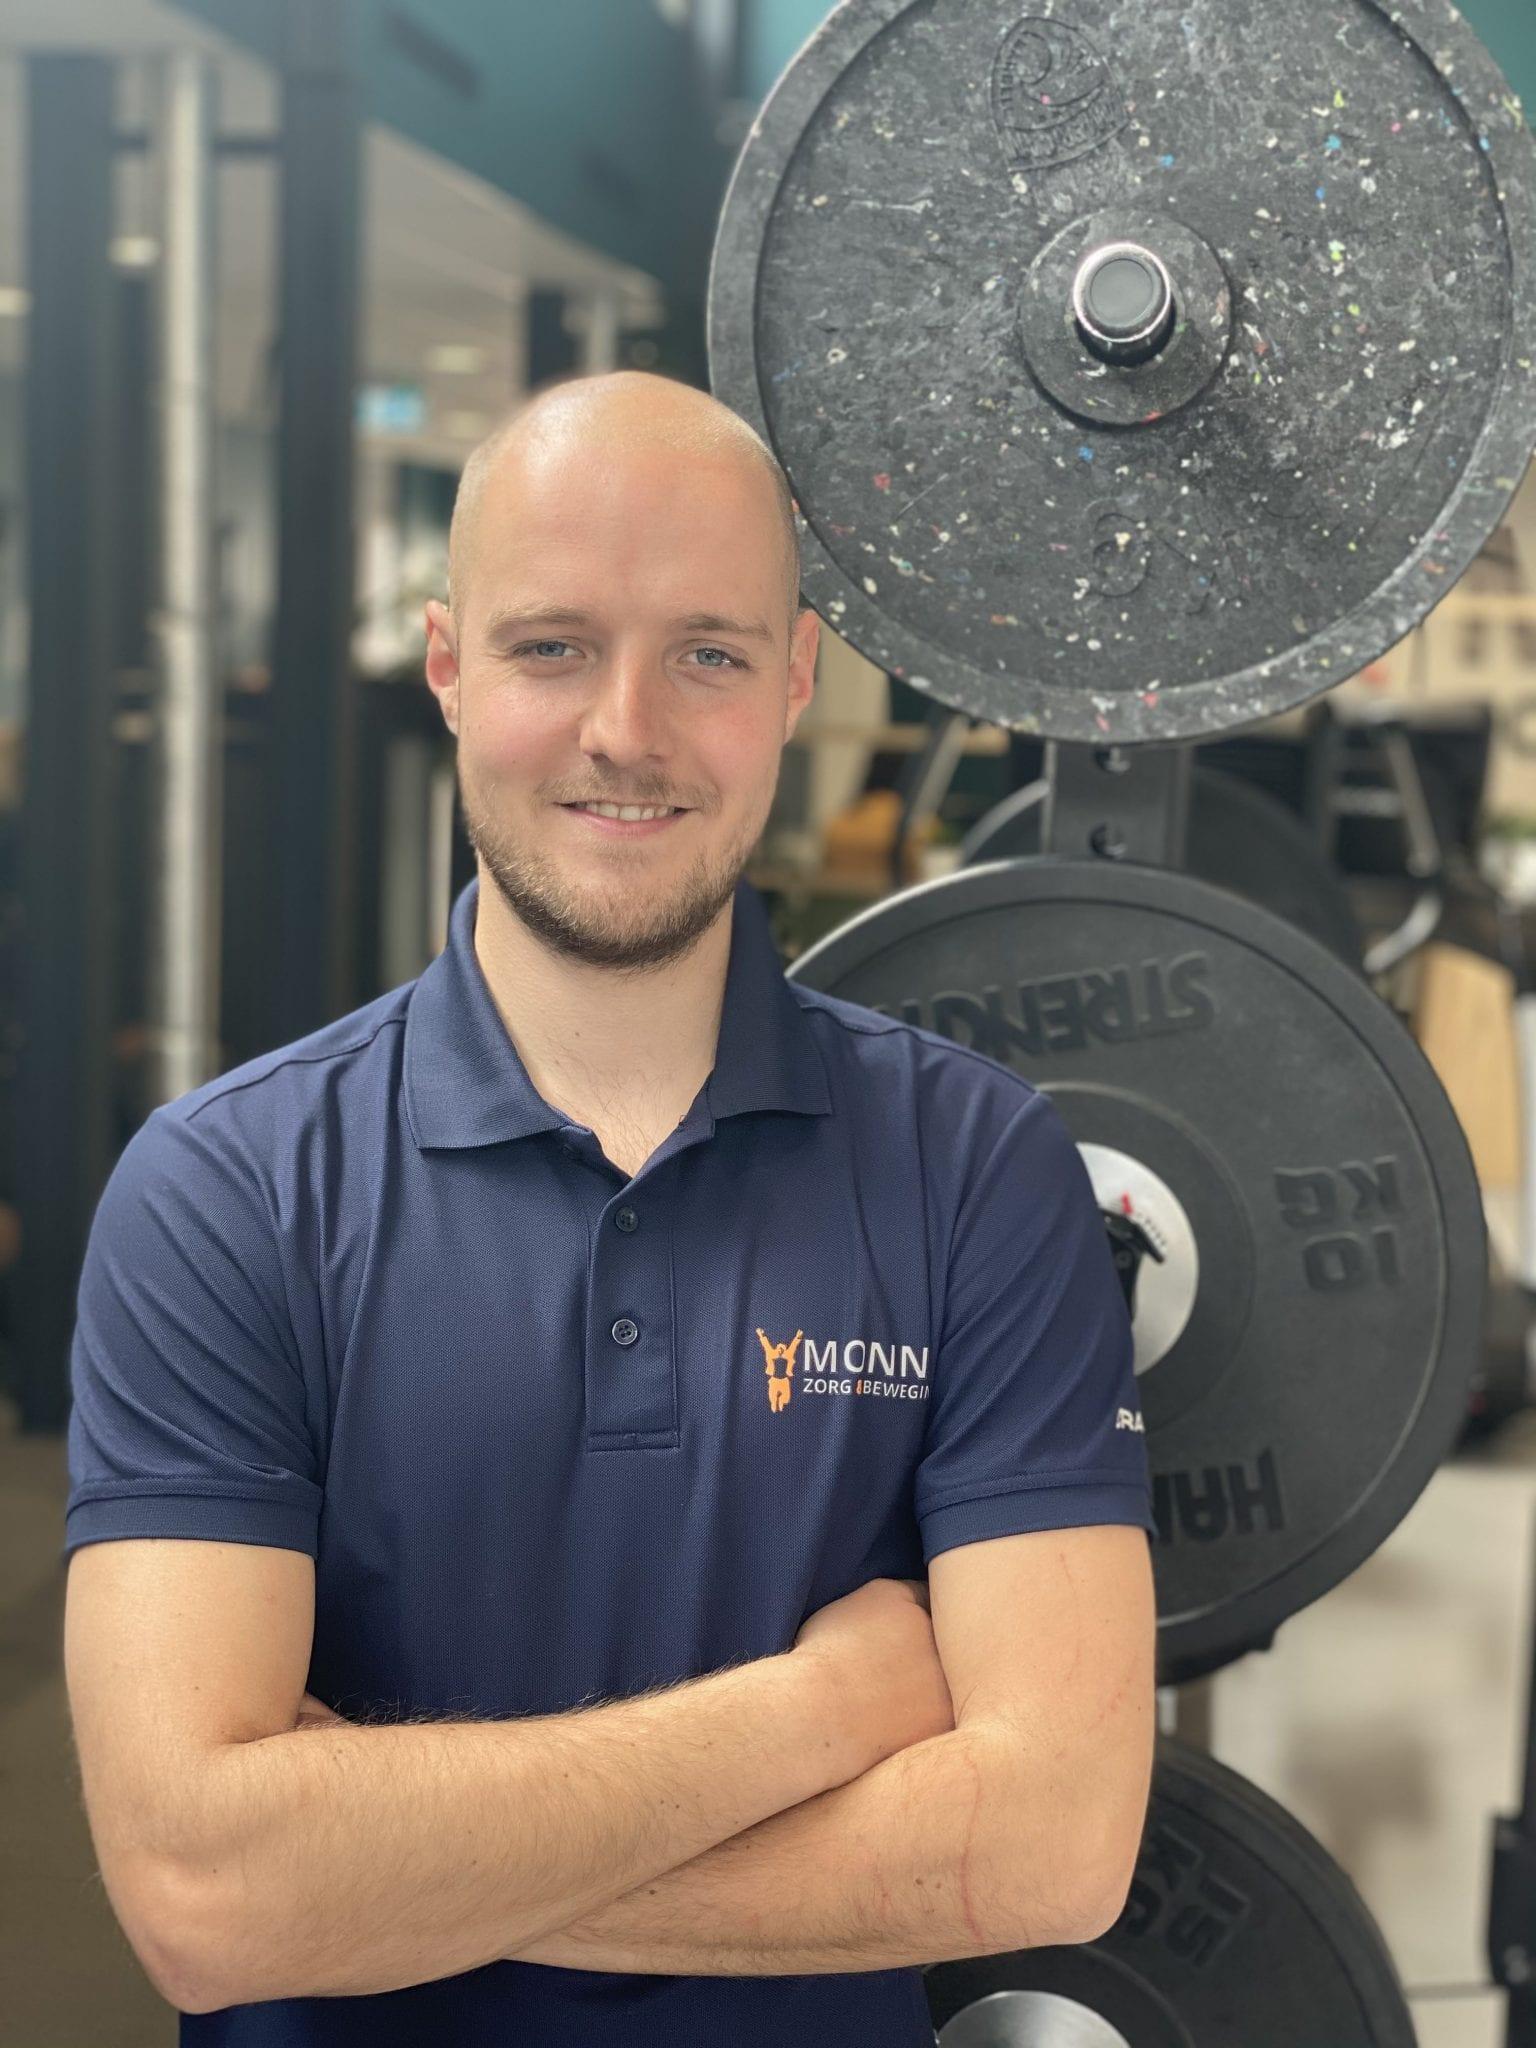 Jasper Trommel, Fysiotherapie | Monné Zorg & Beweging Breda